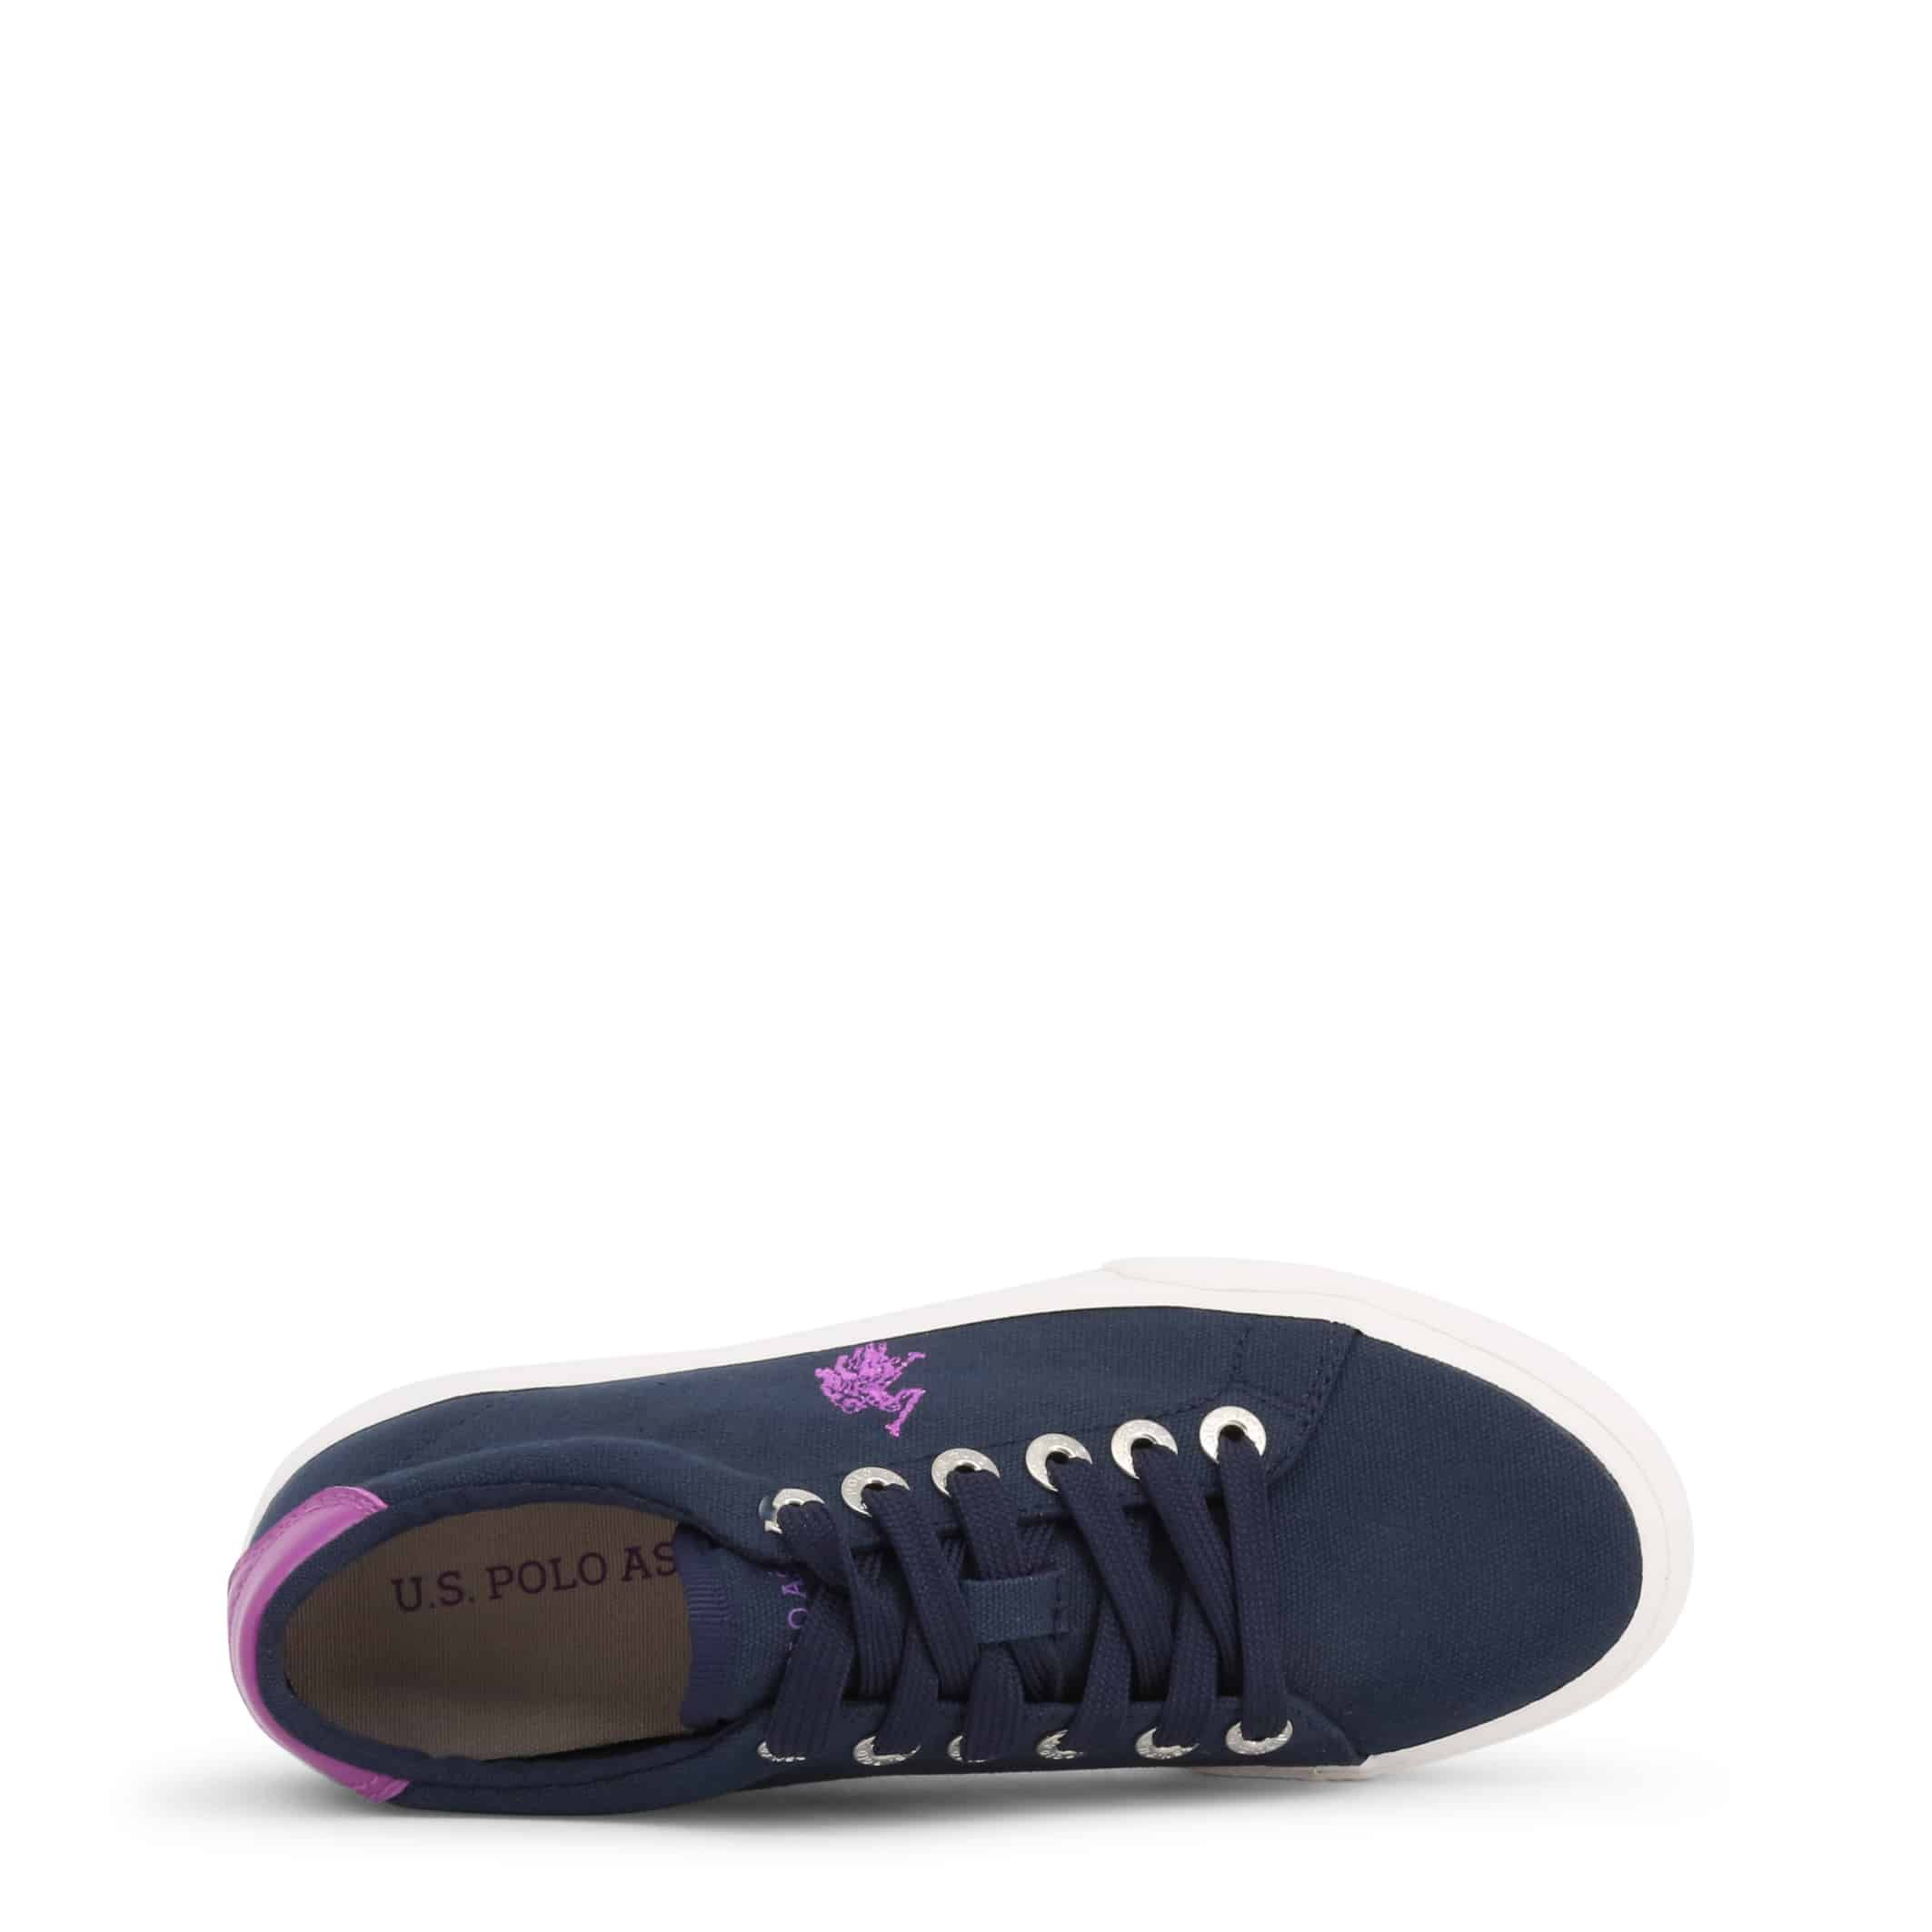 Sneakers U.S. Polo Assn. – MAREW4262S0_CY1